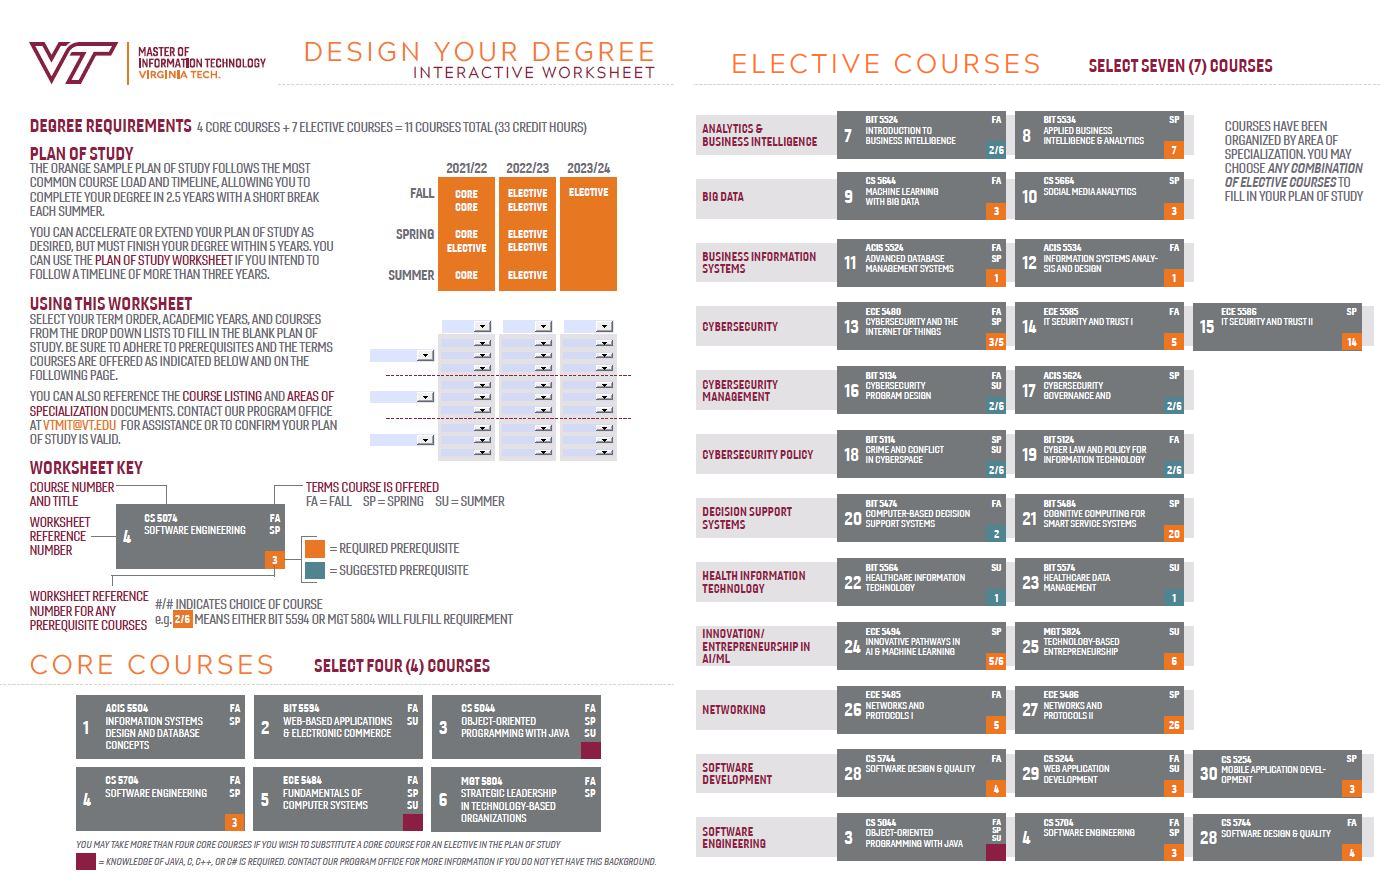 Virginia Tech Academic Calendar 2022 23.Design Your Degree Online Master Of Information Technology Virginia Tech